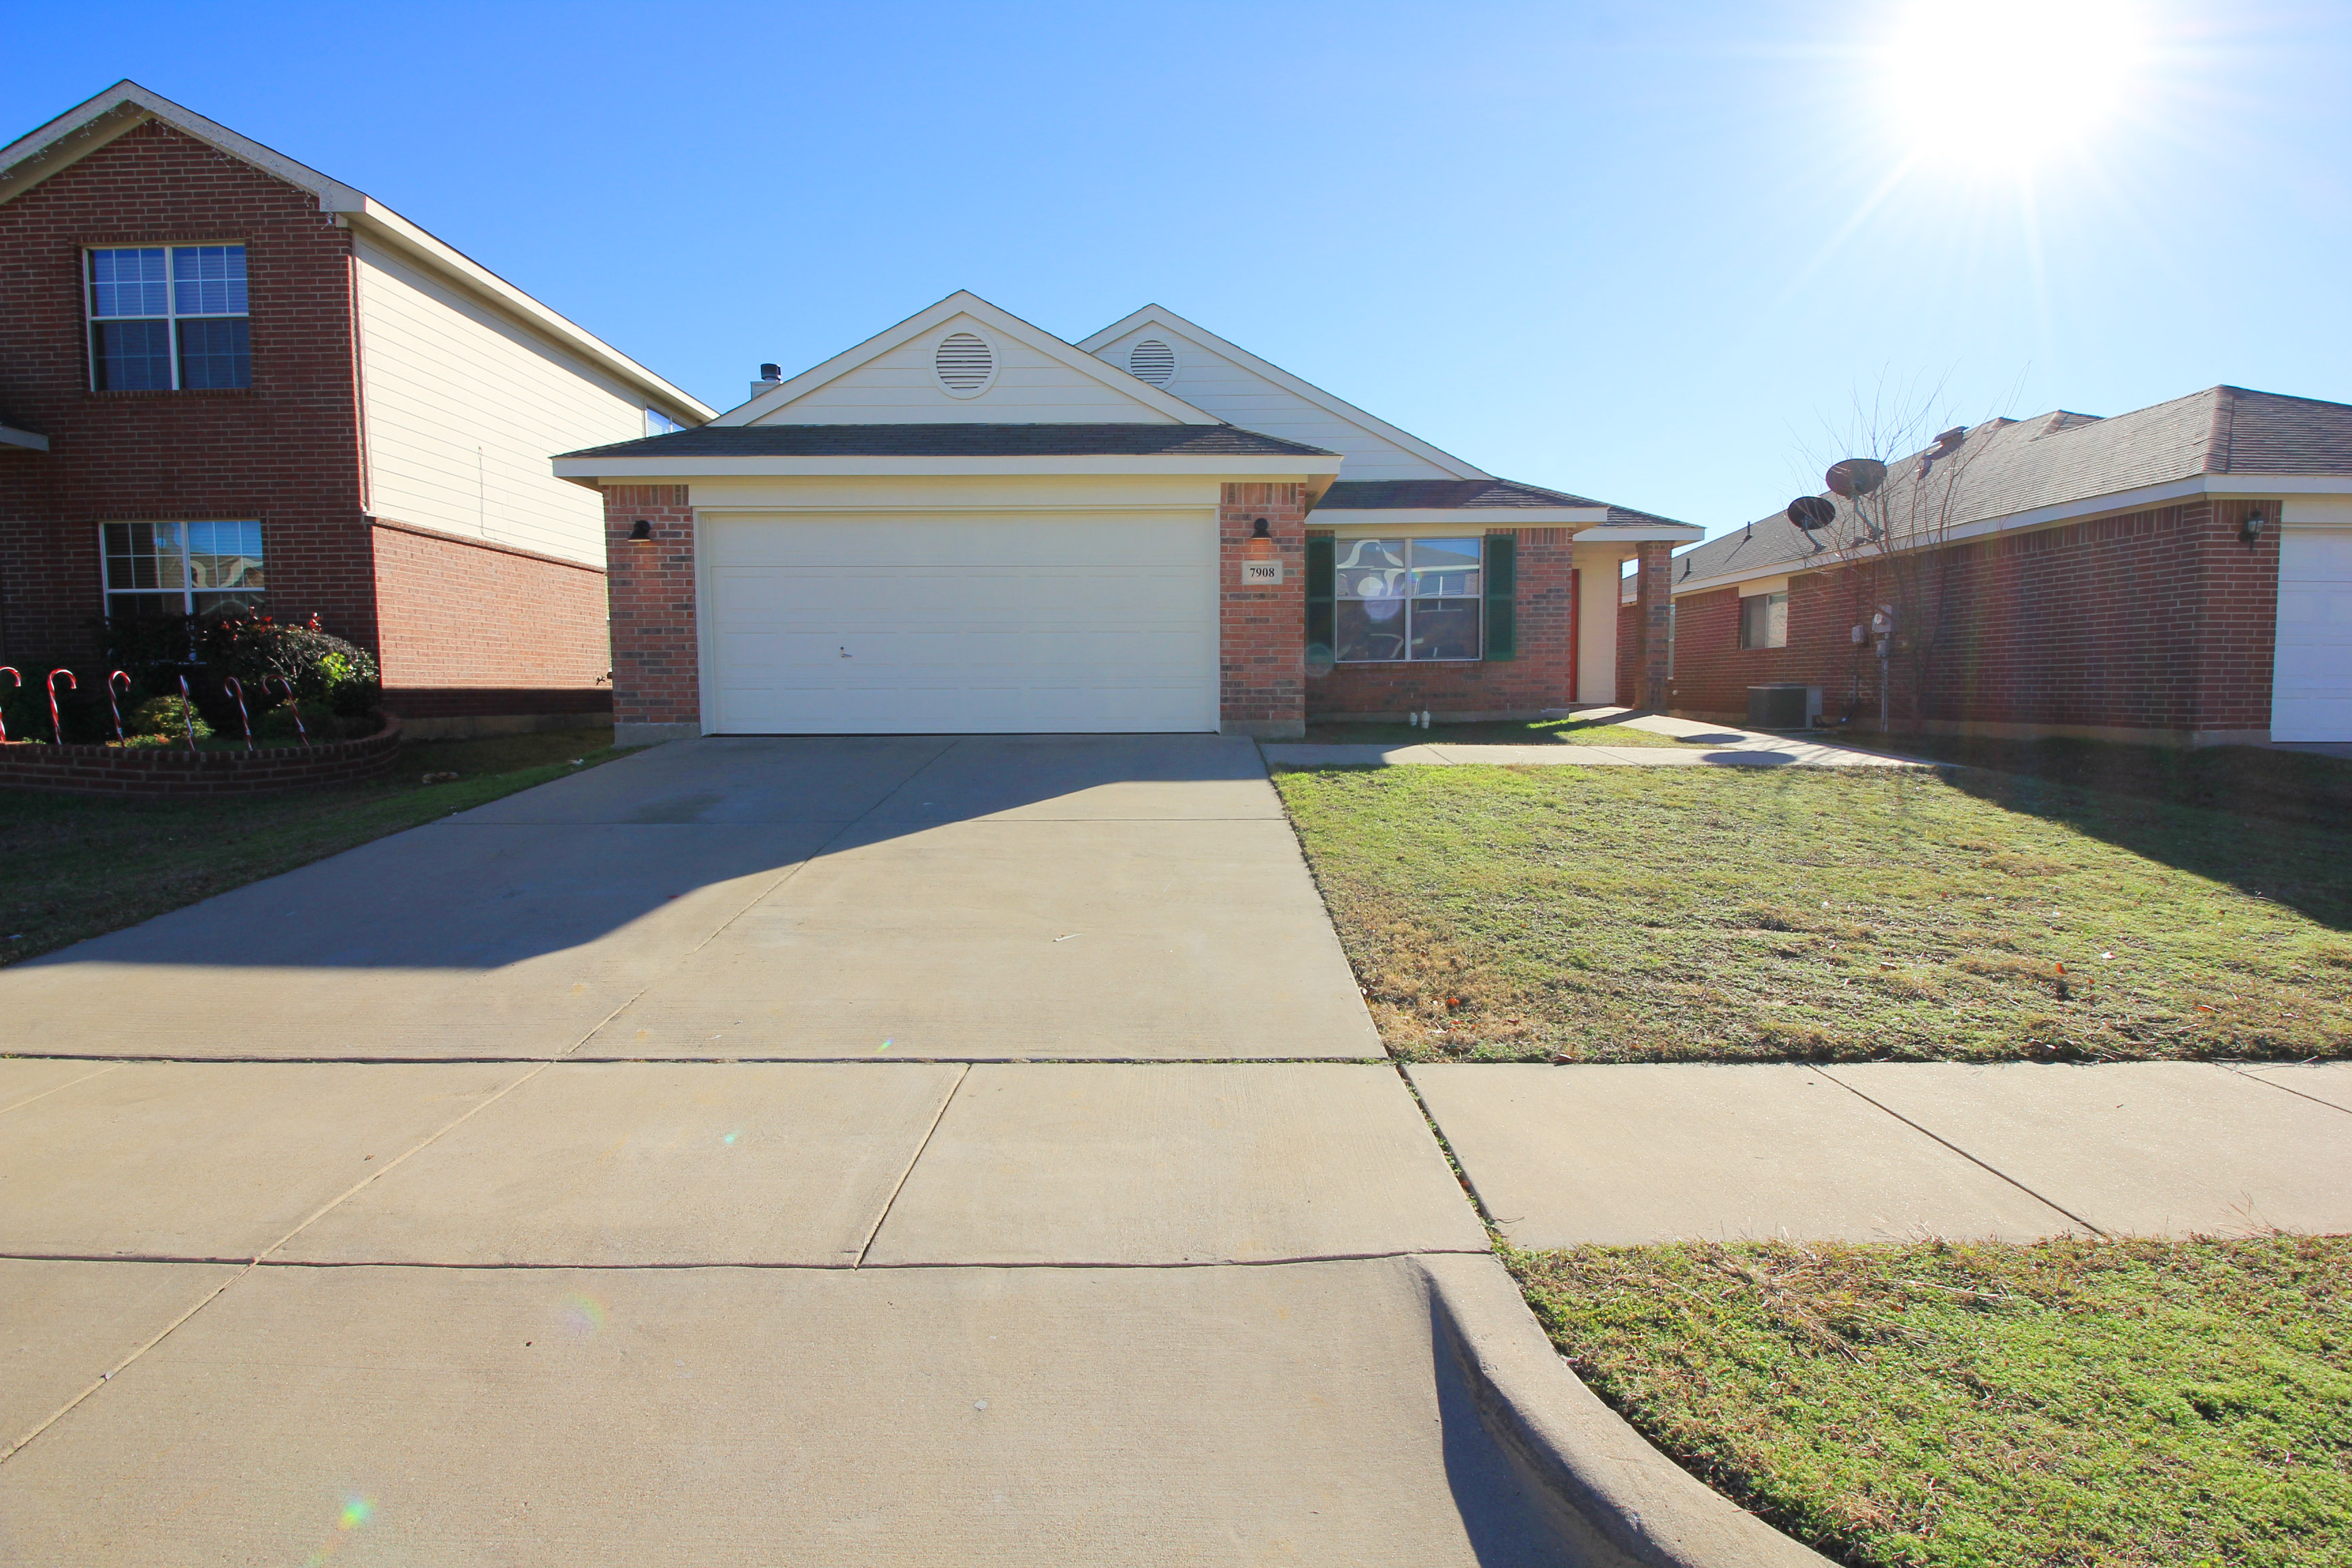 7908 Whitney Ln Ft Worth, TX 76112